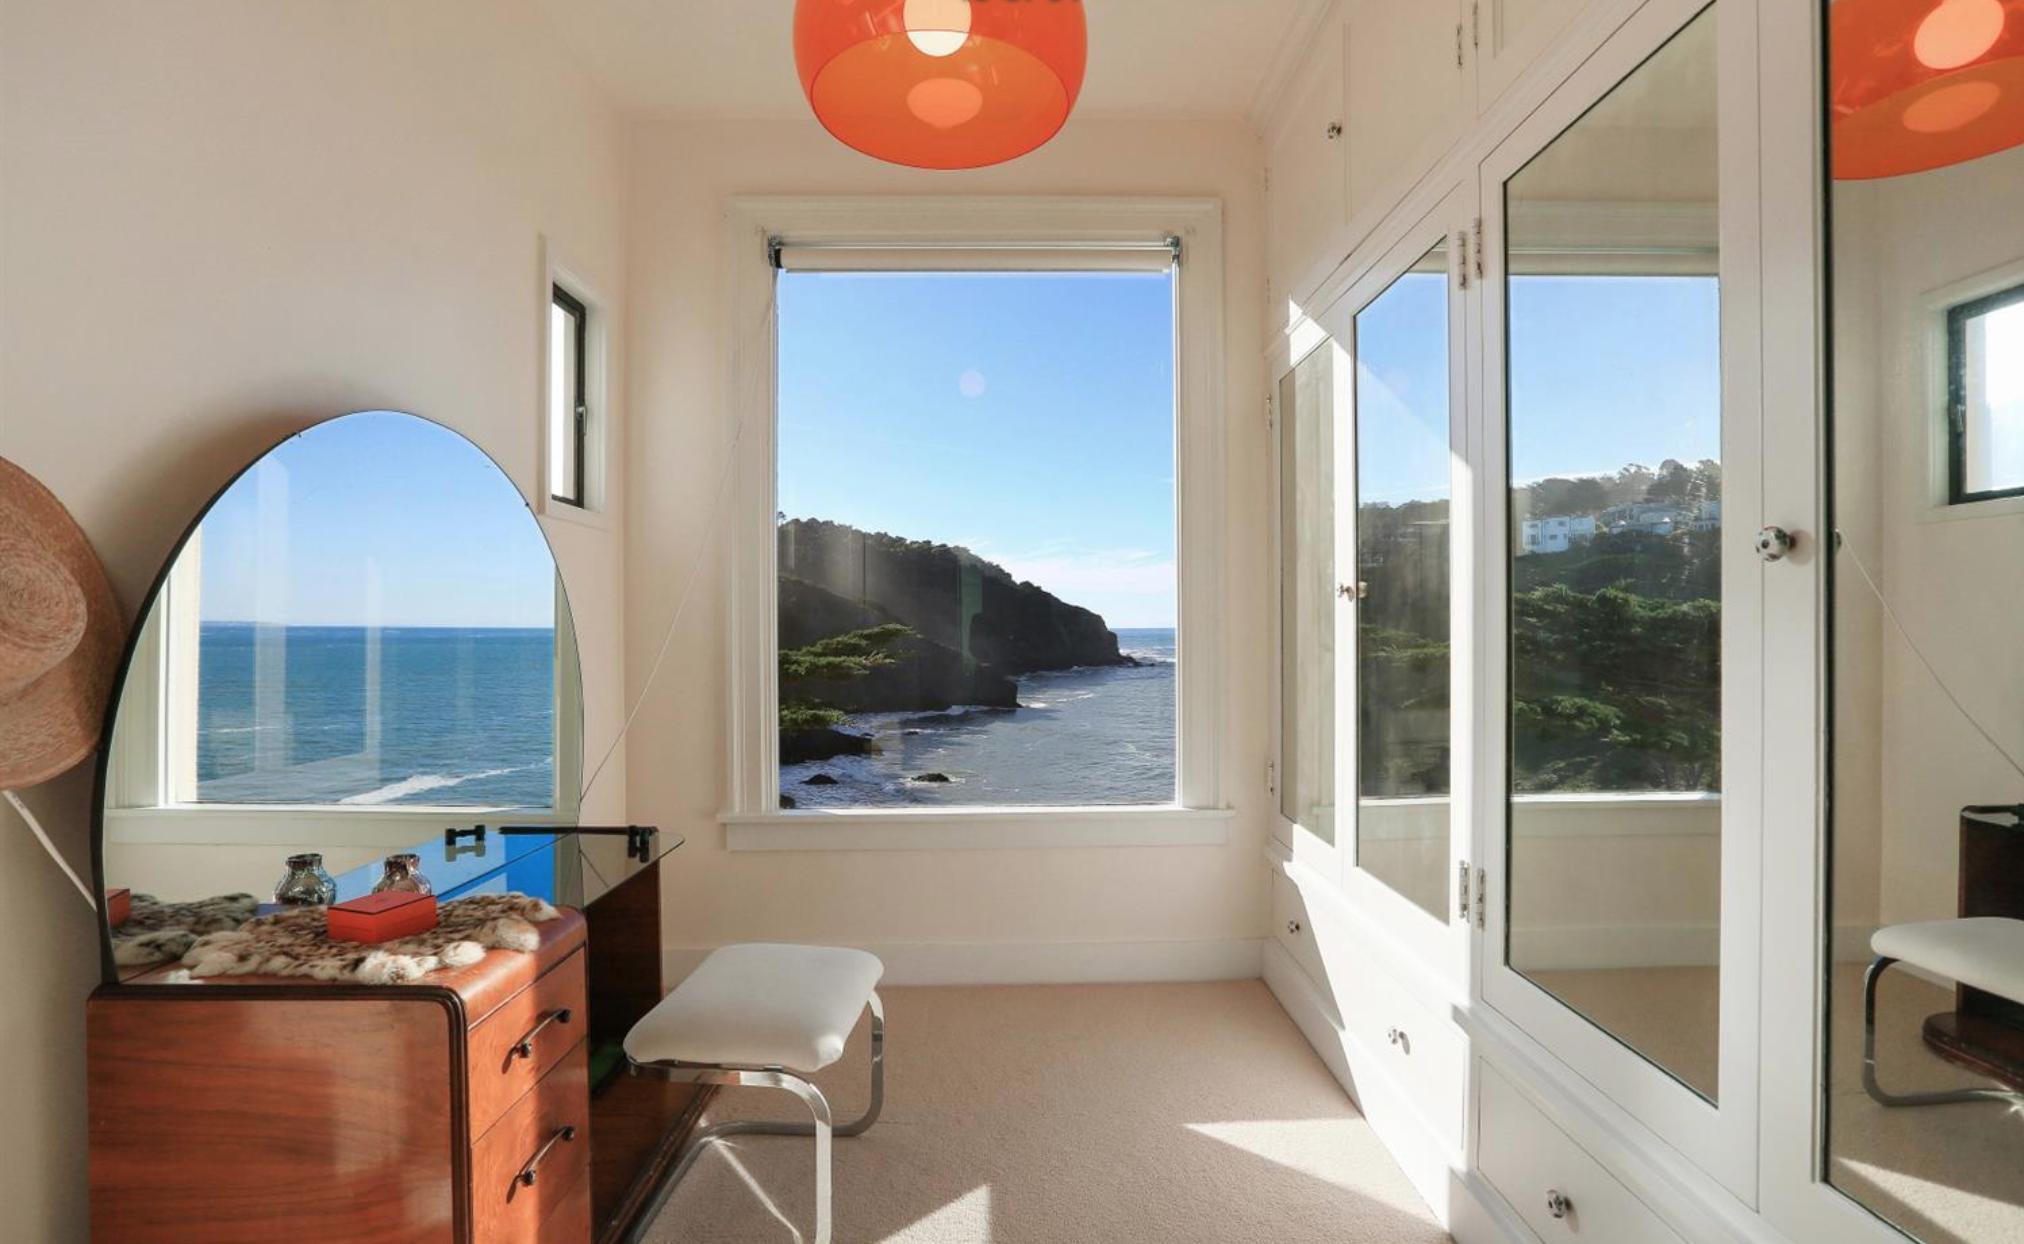 308 Sea Cliff Avenue - Closet Views